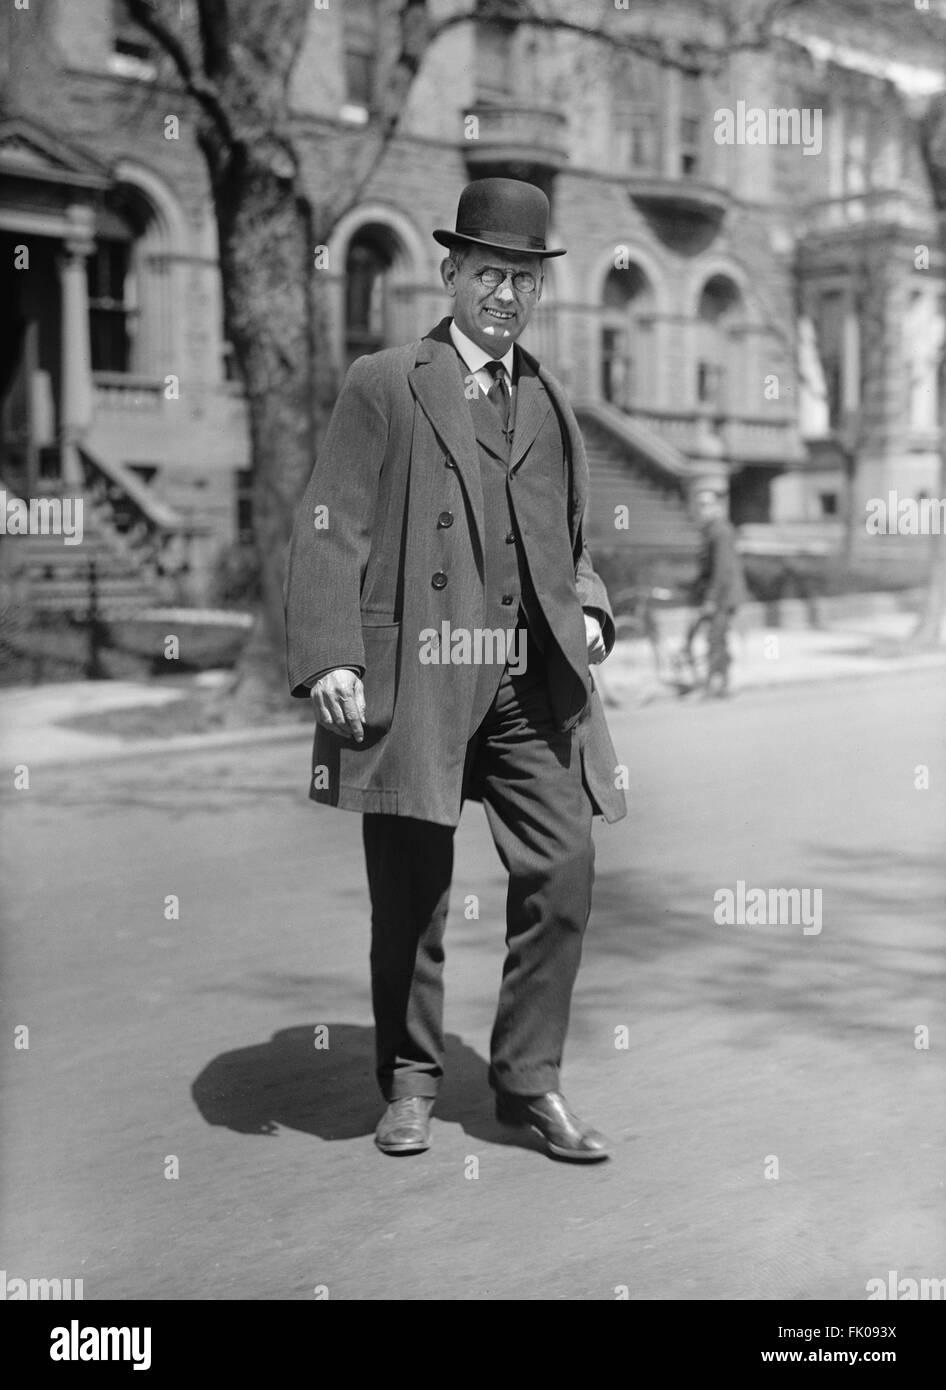 Louis Brandeis, Associate Justice, U.S. Supreme Court, Portrait, circa 1917.jpg - Stock Image